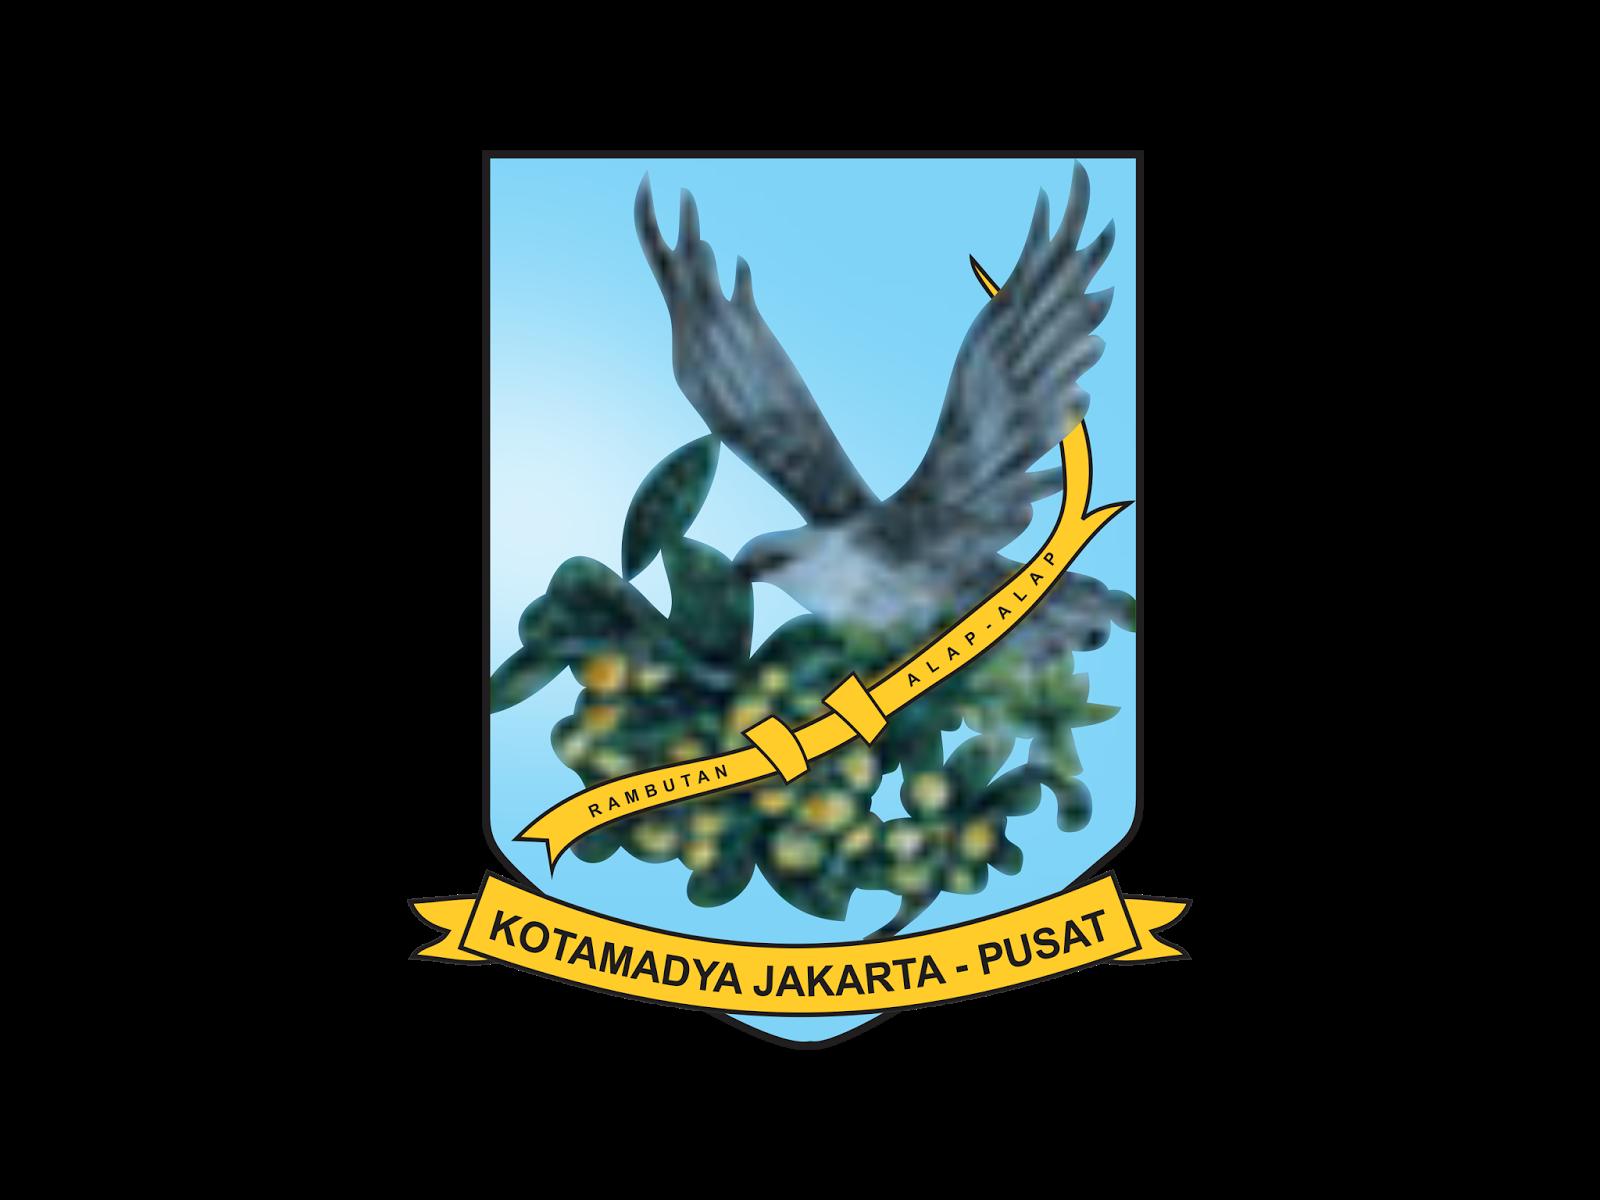 Logo Kota Administrasi Jakarta Pusat Vector Cdr Png Hd Gudril